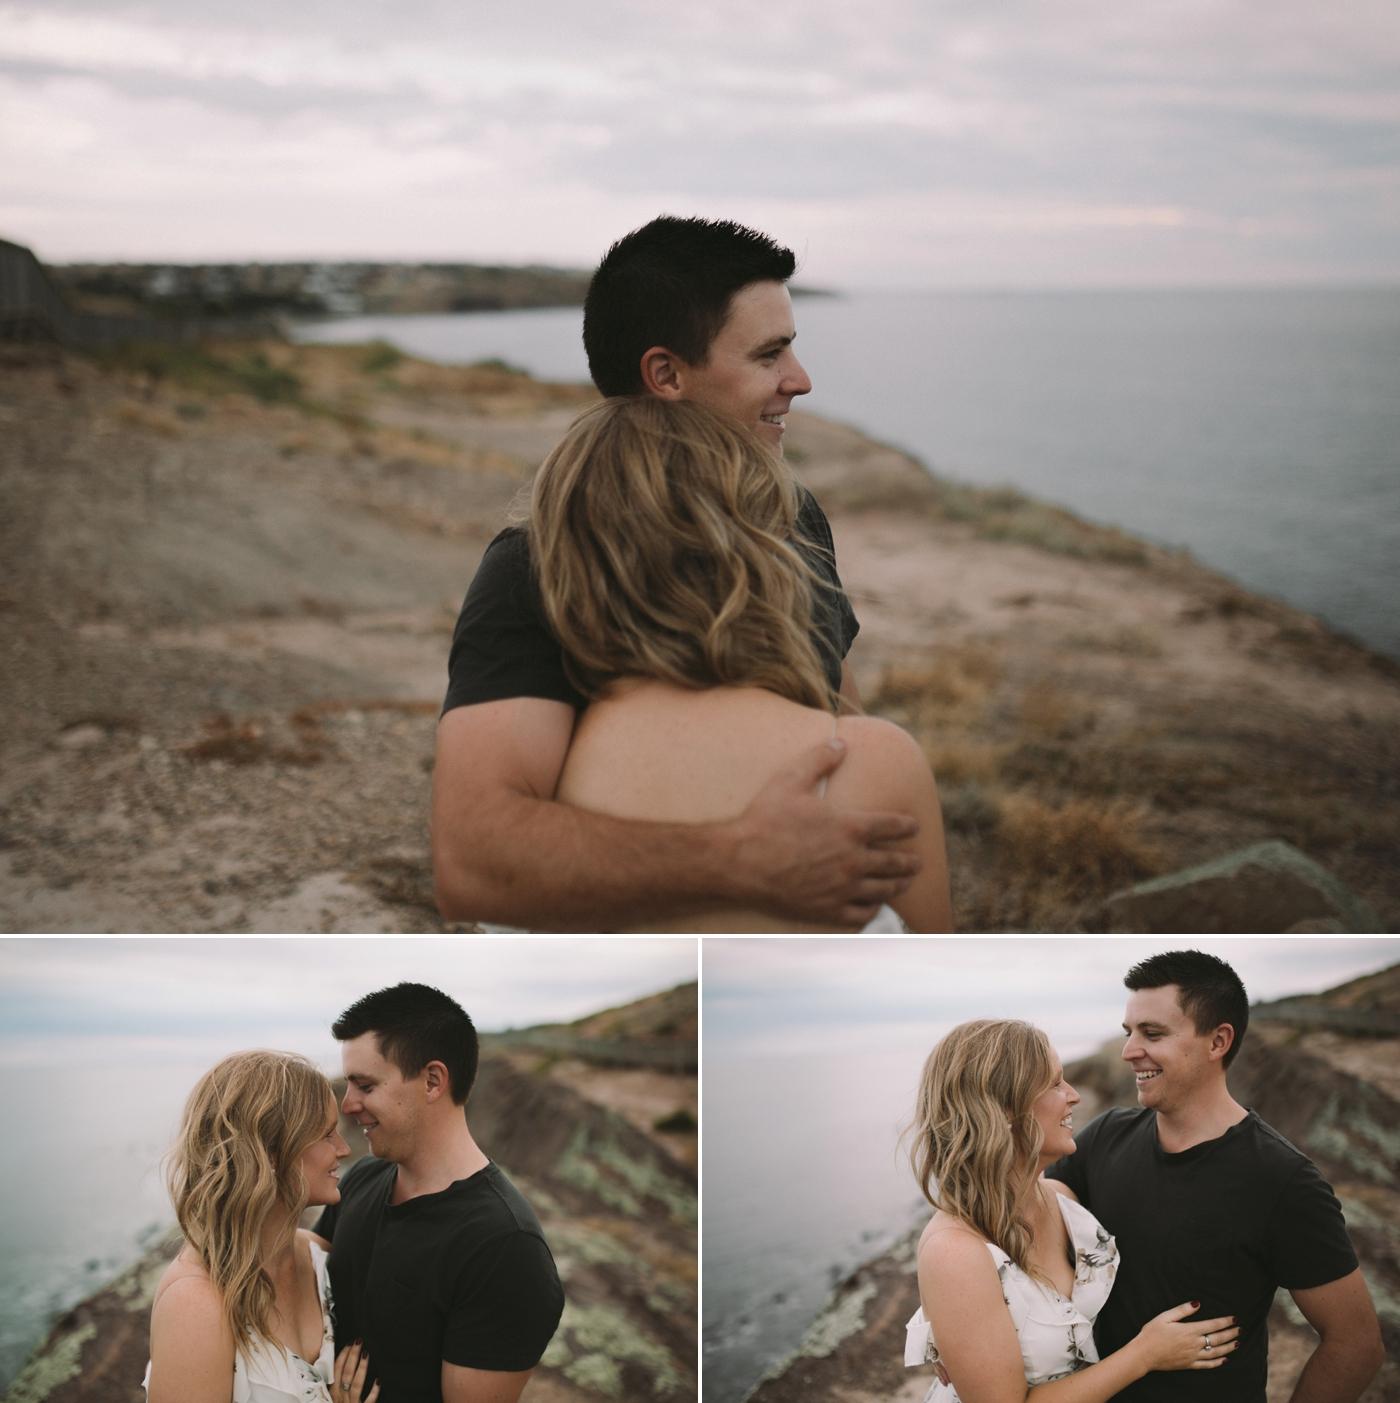 Lisa & Lachlan - Adelaide Engagement Photographer - Natural photographer in Adelaide - www.katherineschultzphotography.com 4